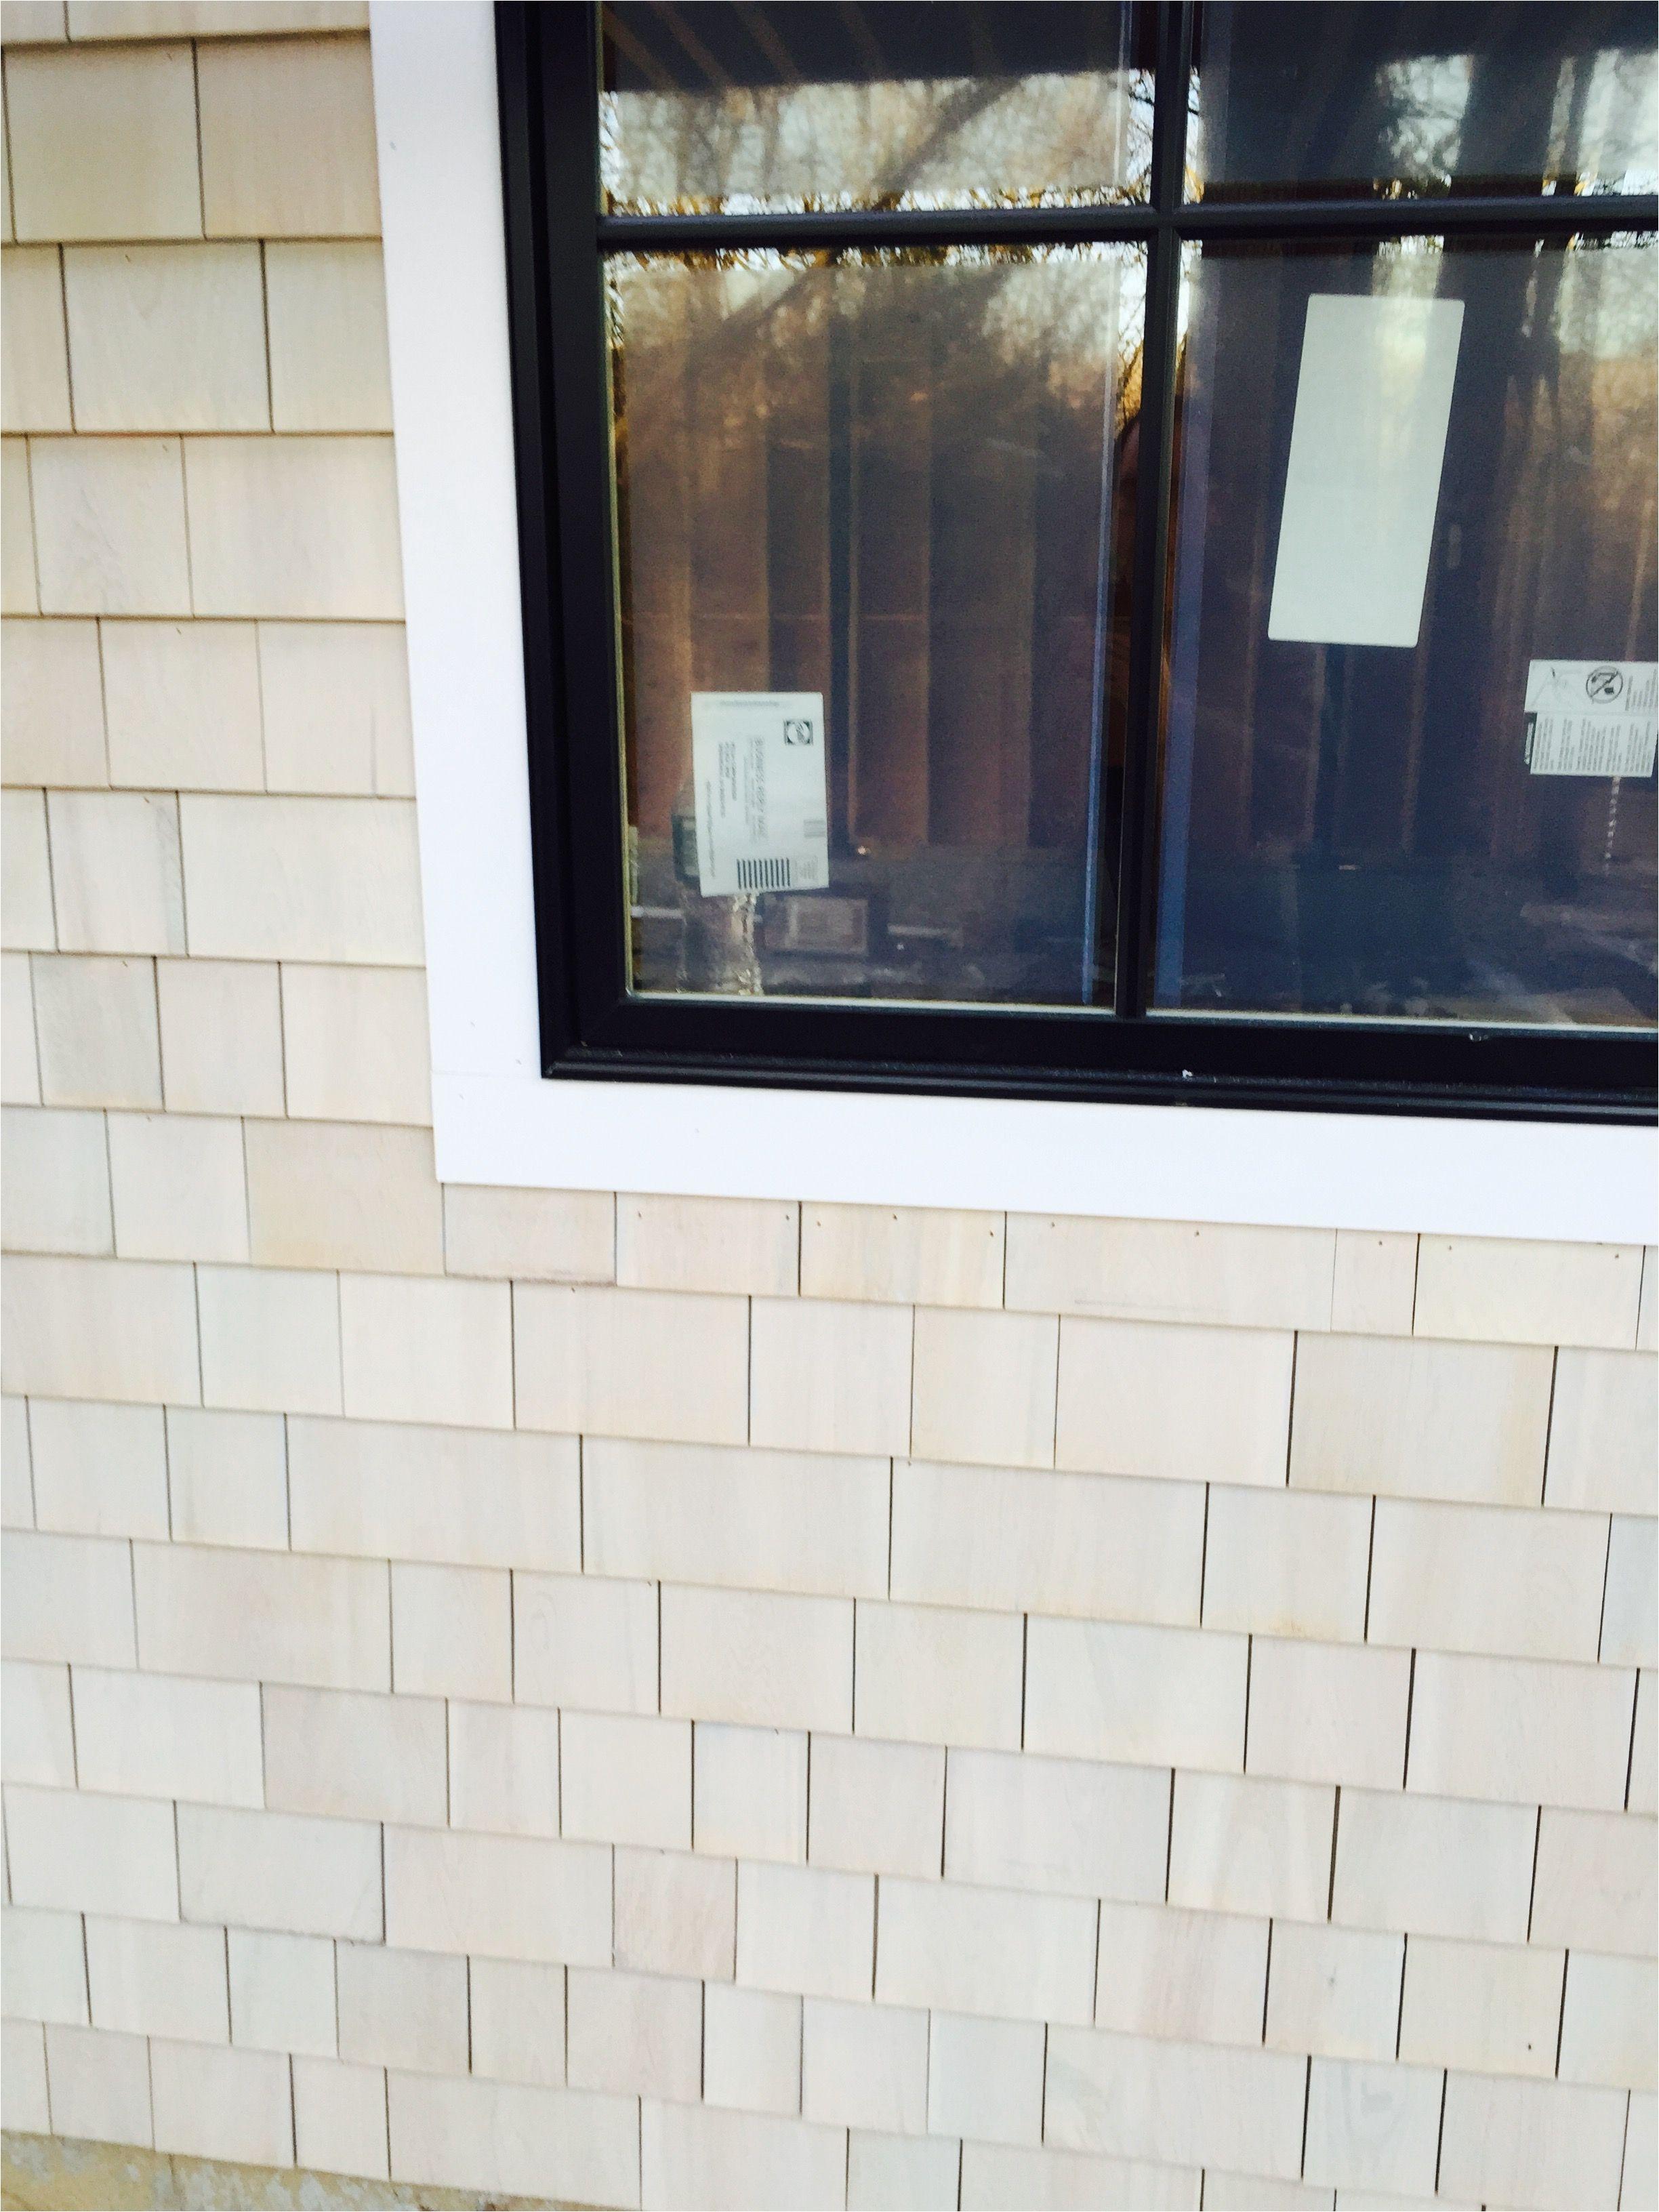 maibec white cedar shingle with bleaching agent next to pella casement window with black finish